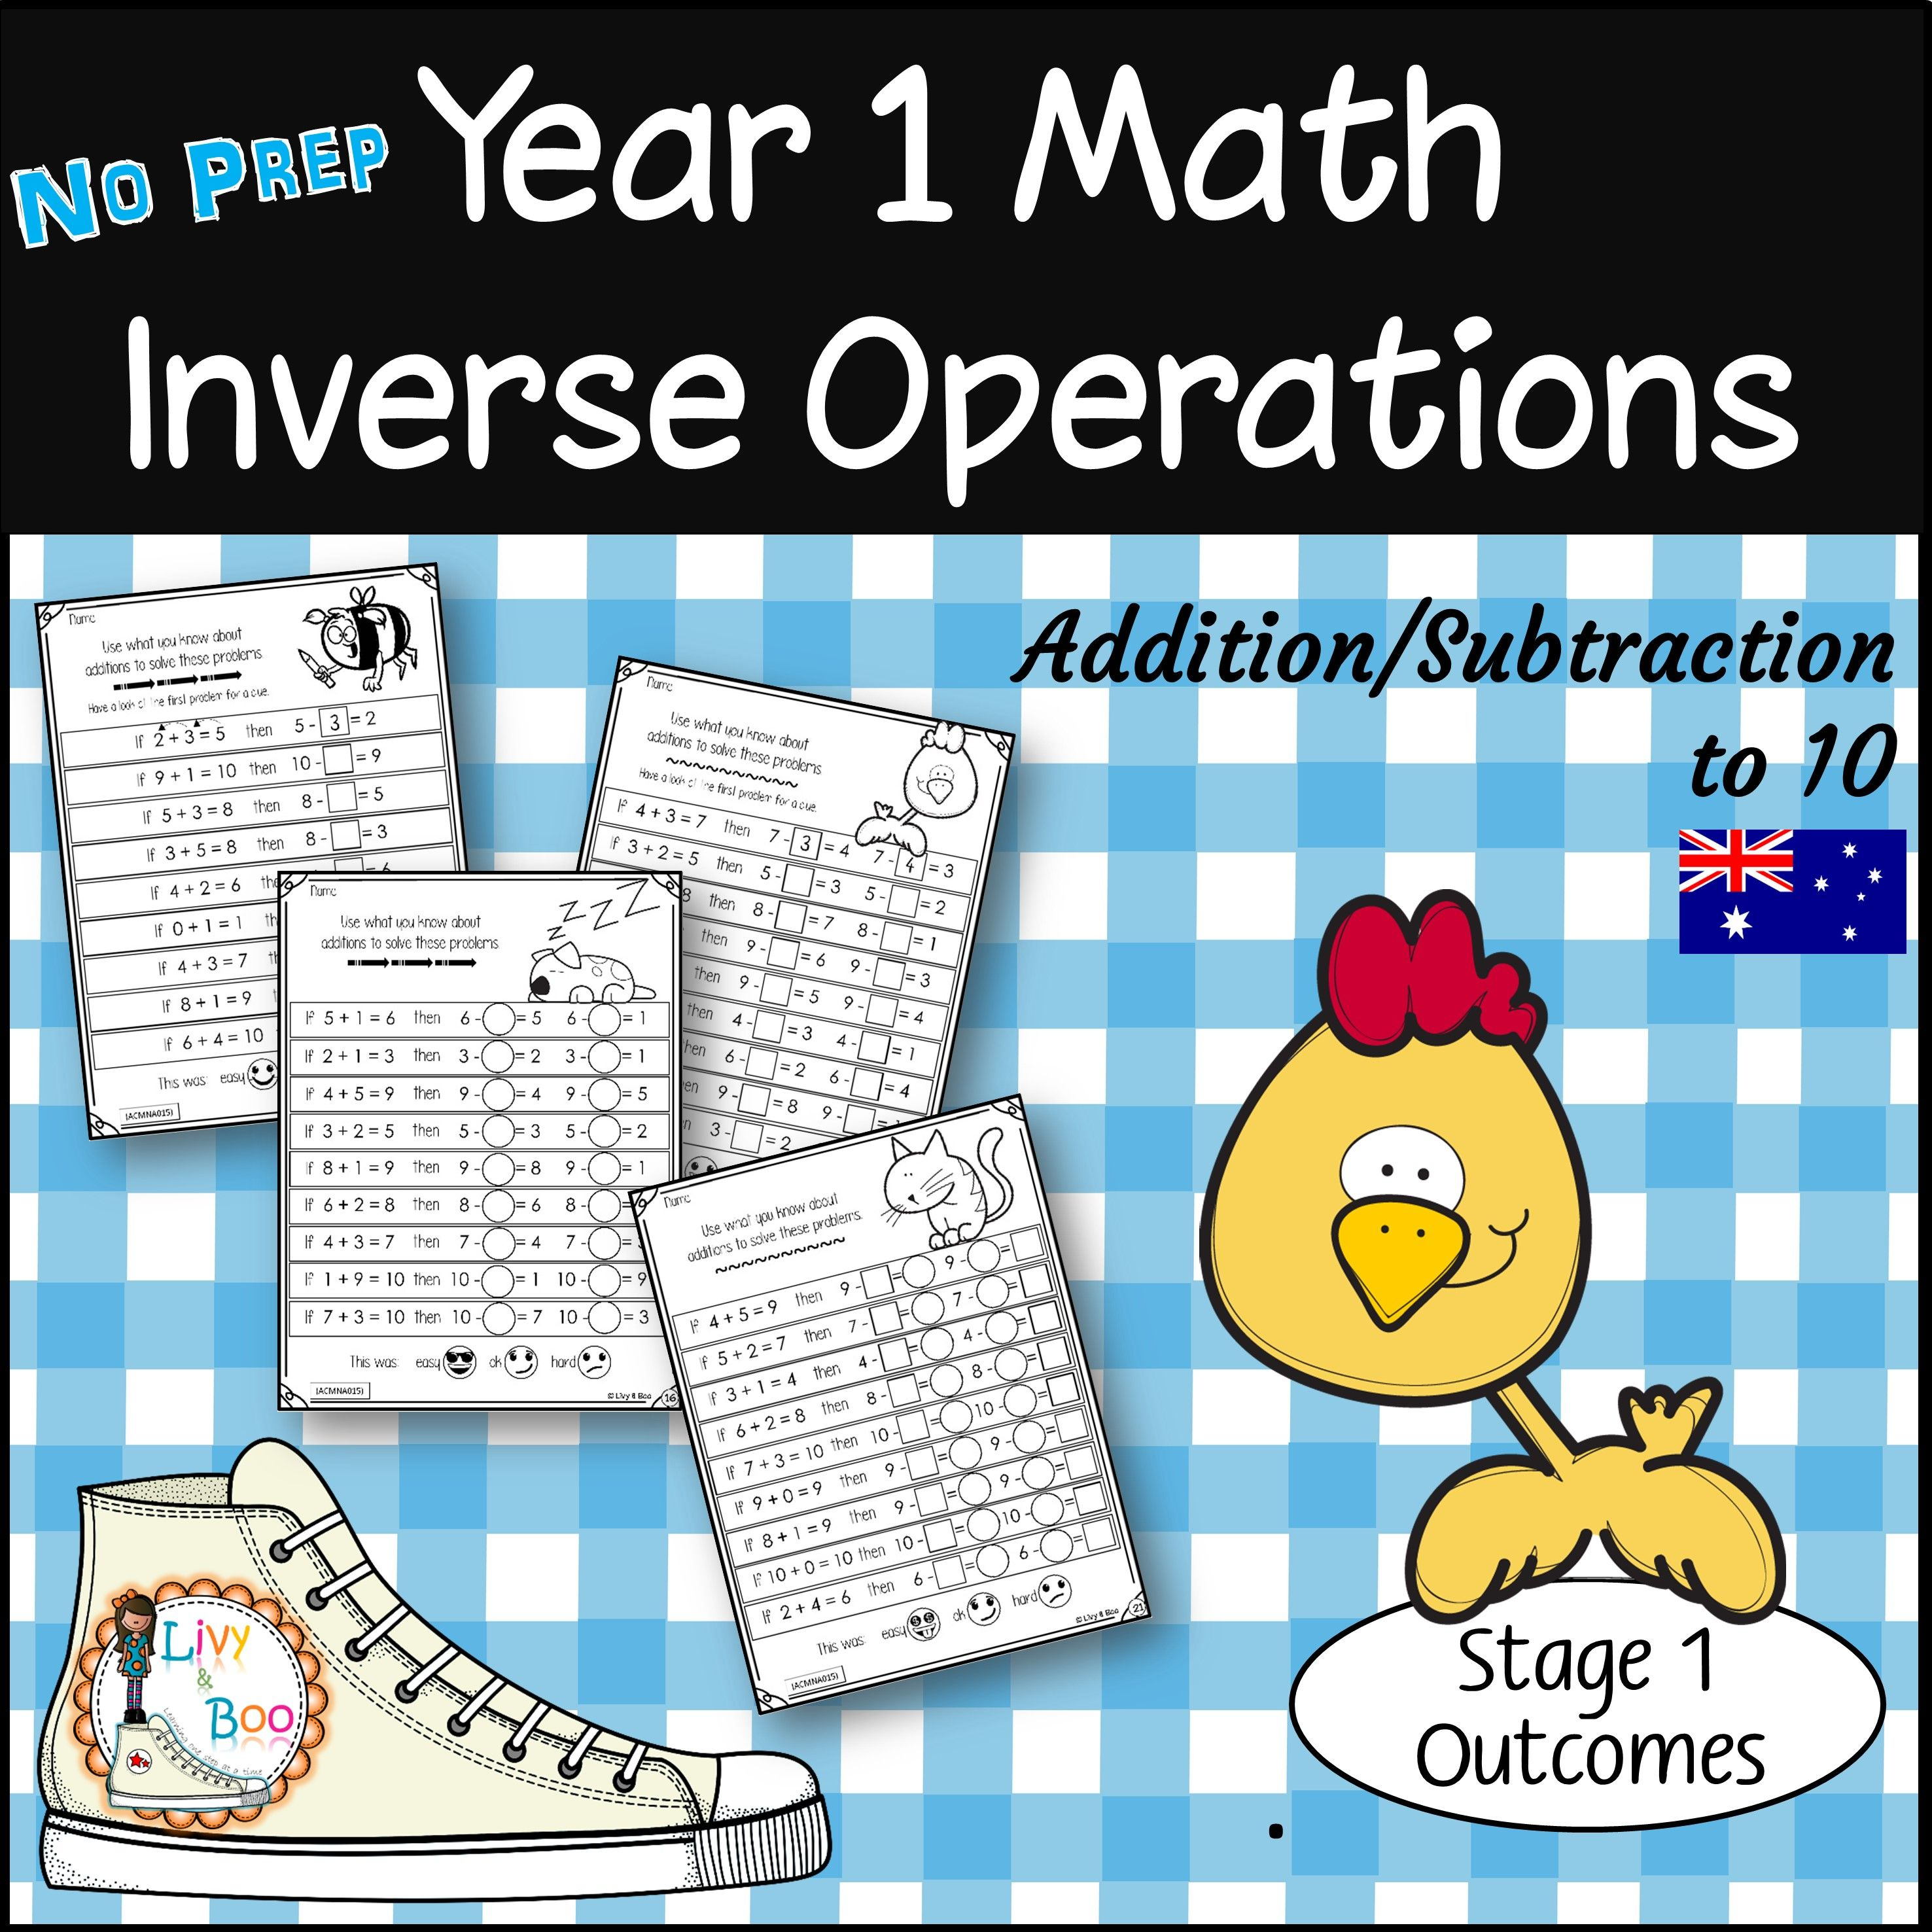 Year 1 Math - Inverse Operations to 10 - No Prep Worksheets | Livy ...